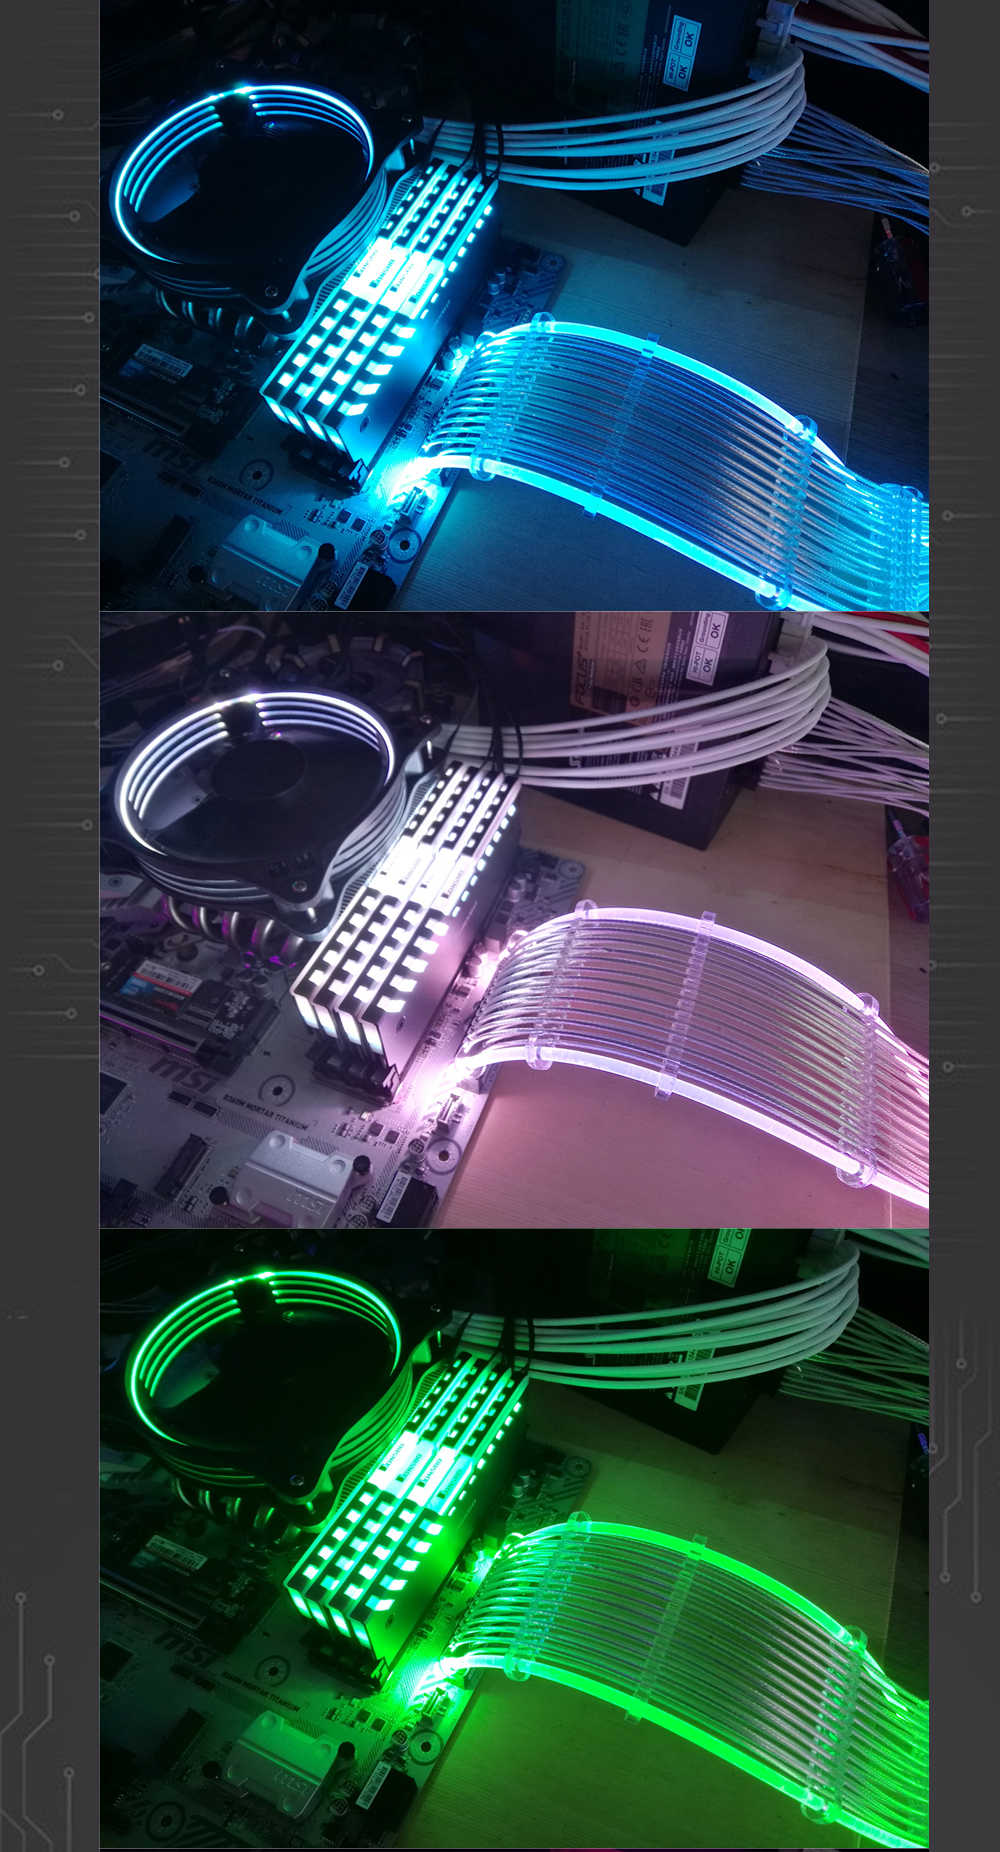 PSU RGB レインボー 延長ケーブル ATX 24ピン GPU 8(6 + 2)ピン 5V同期